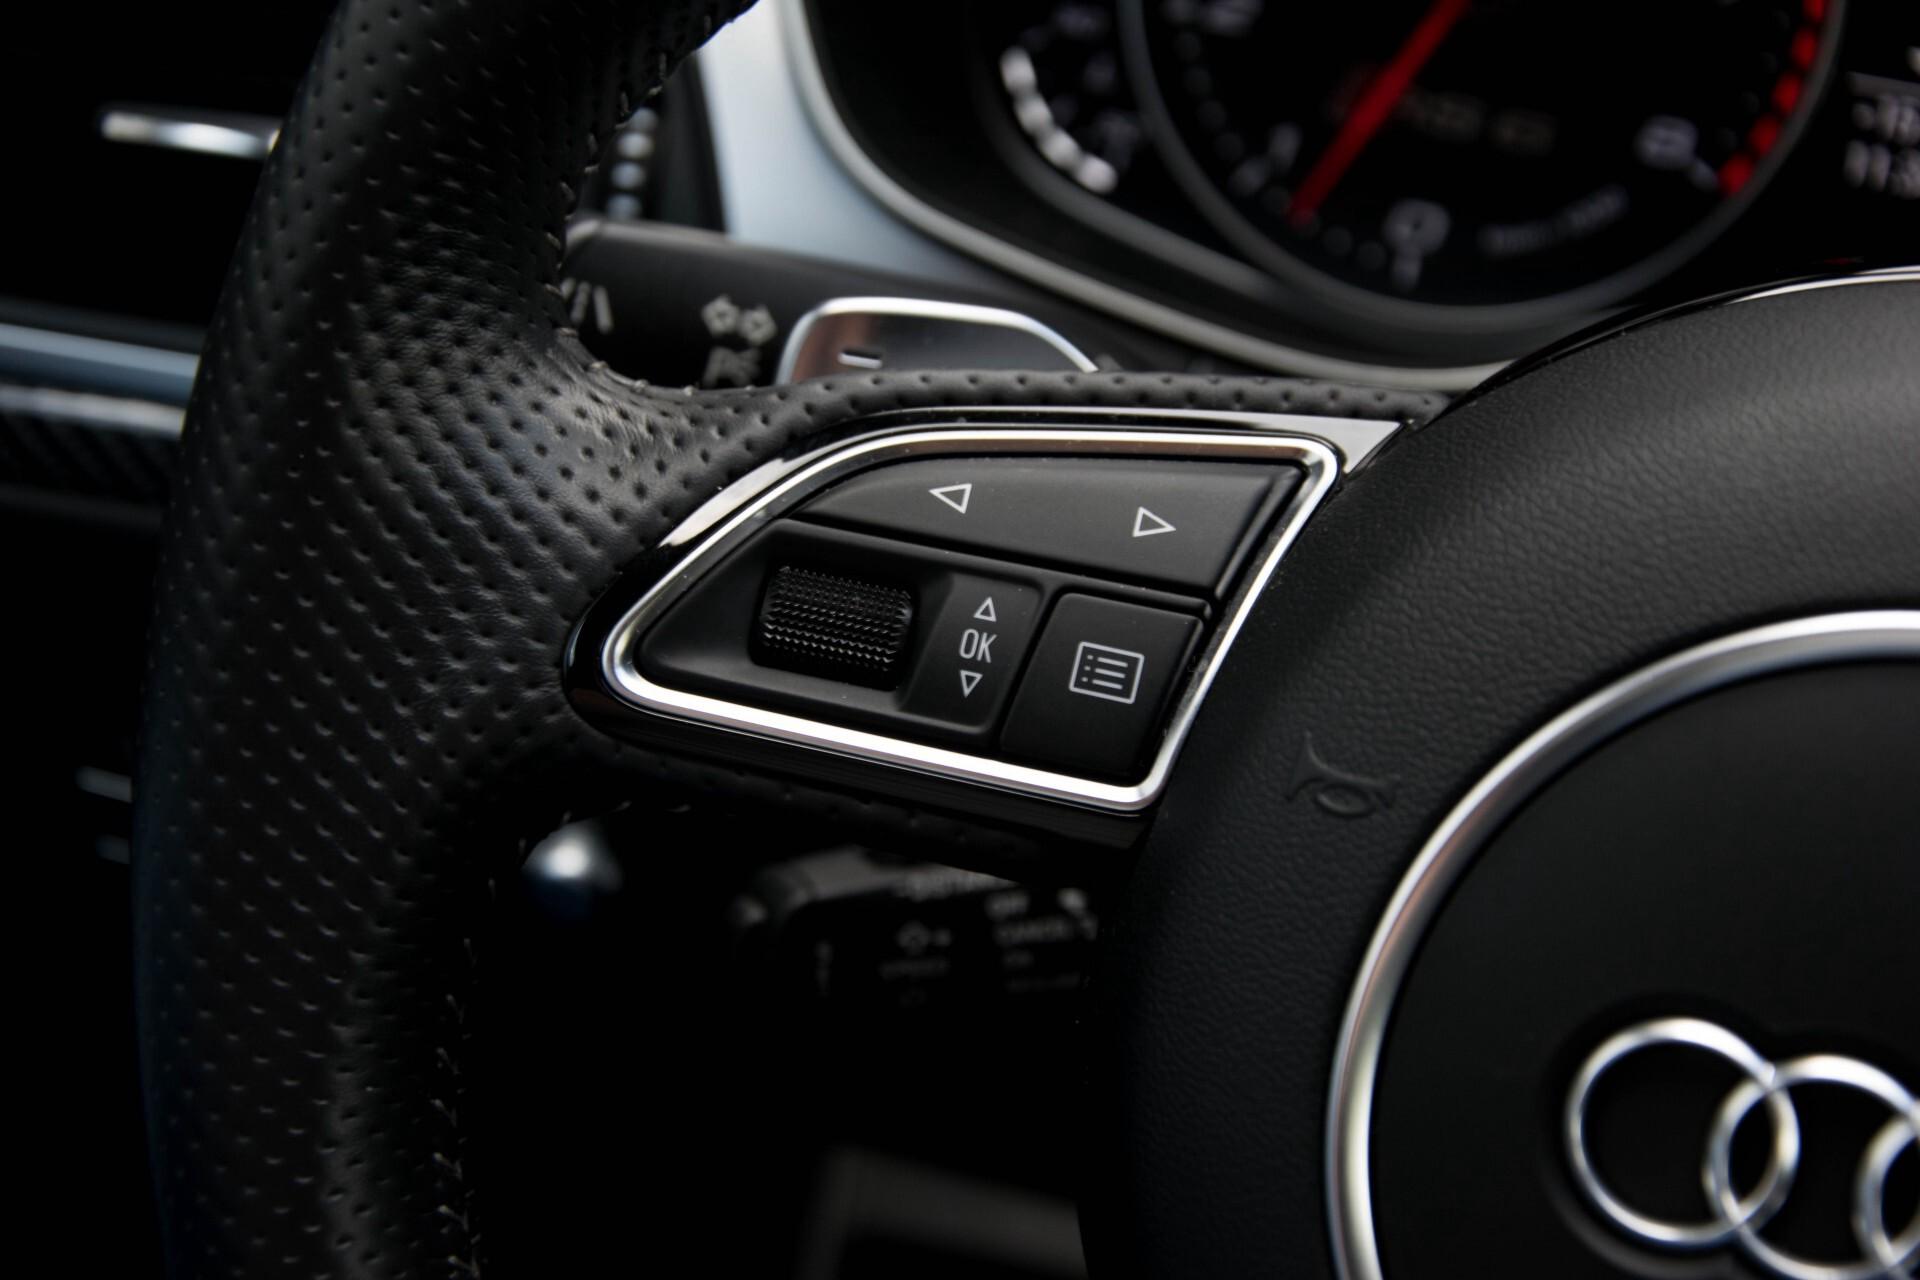 Audi RS6 Avant 4.0 TFSI Quattro B&O/Carbon/Head-Up/Nachtzicht/Exclusive/Camera/Keyless/Pano Aut8 Foto 10